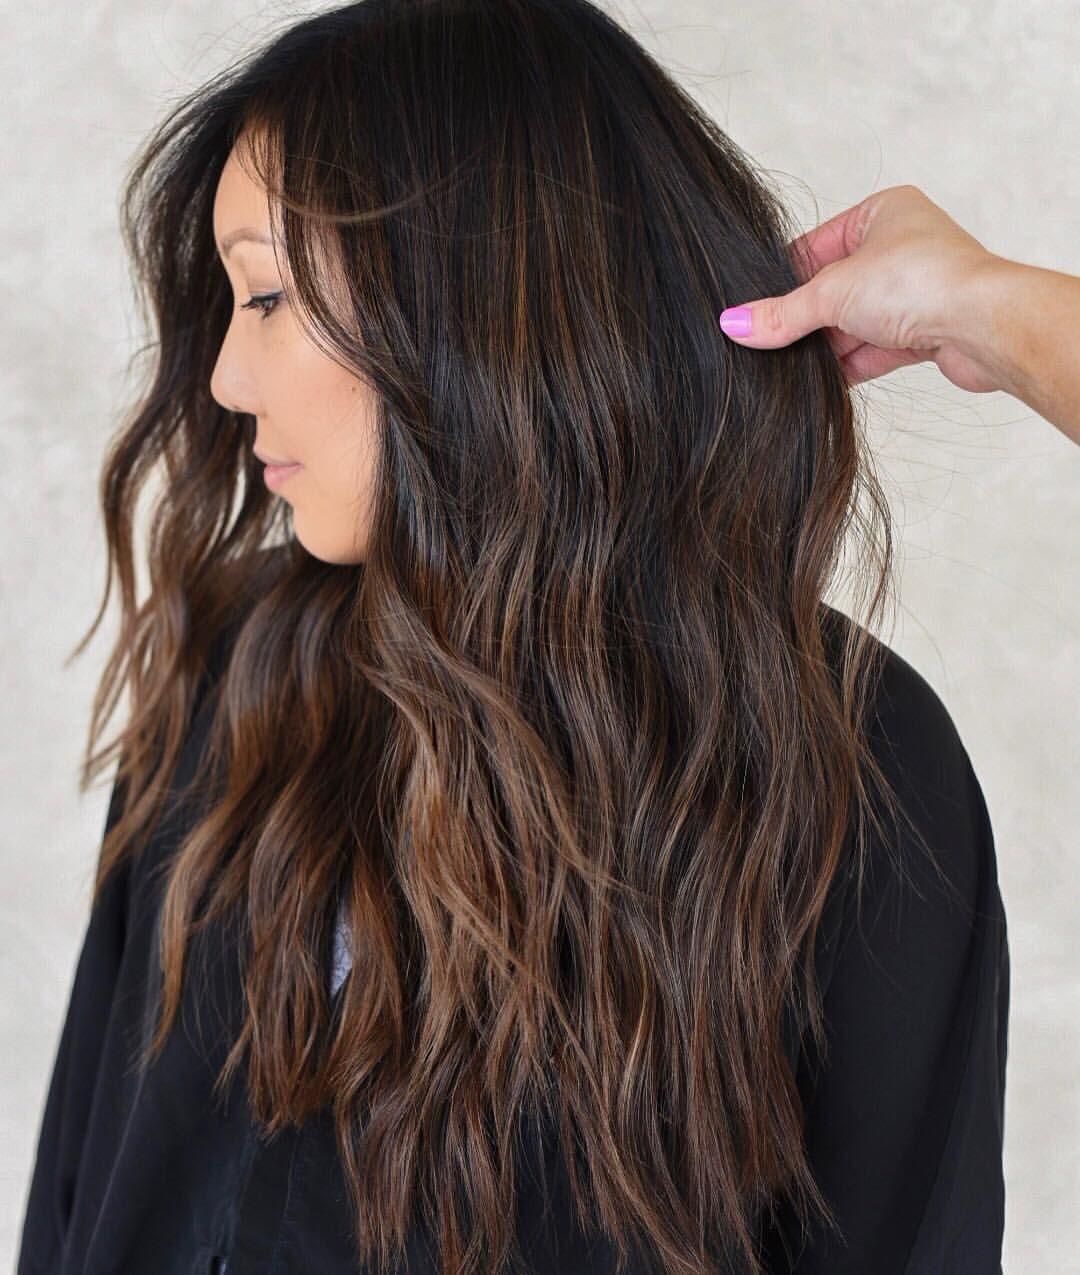 How To Tone Brassy Dark Hair No Damage Toner For Brown Hair Dark Blonde Hair Color Dark Blonde Hair